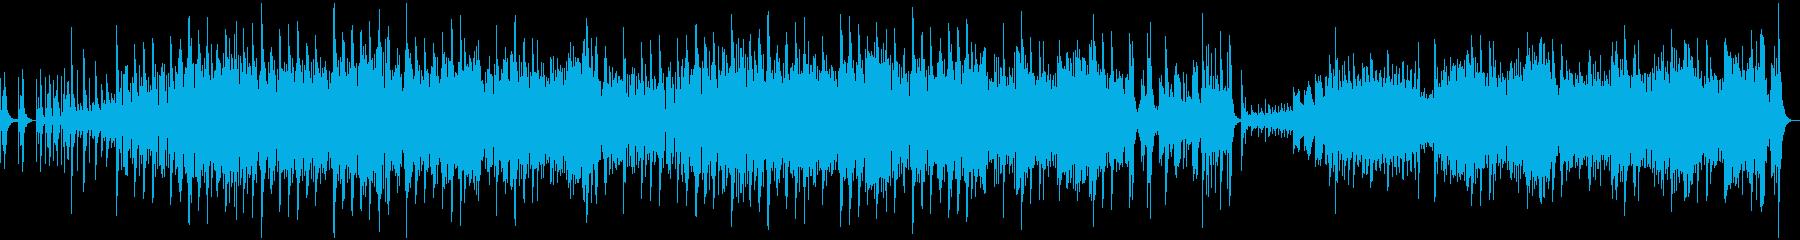 和風・三味線/箏/尺八/和太鼓・和洋折衷の再生済みの波形